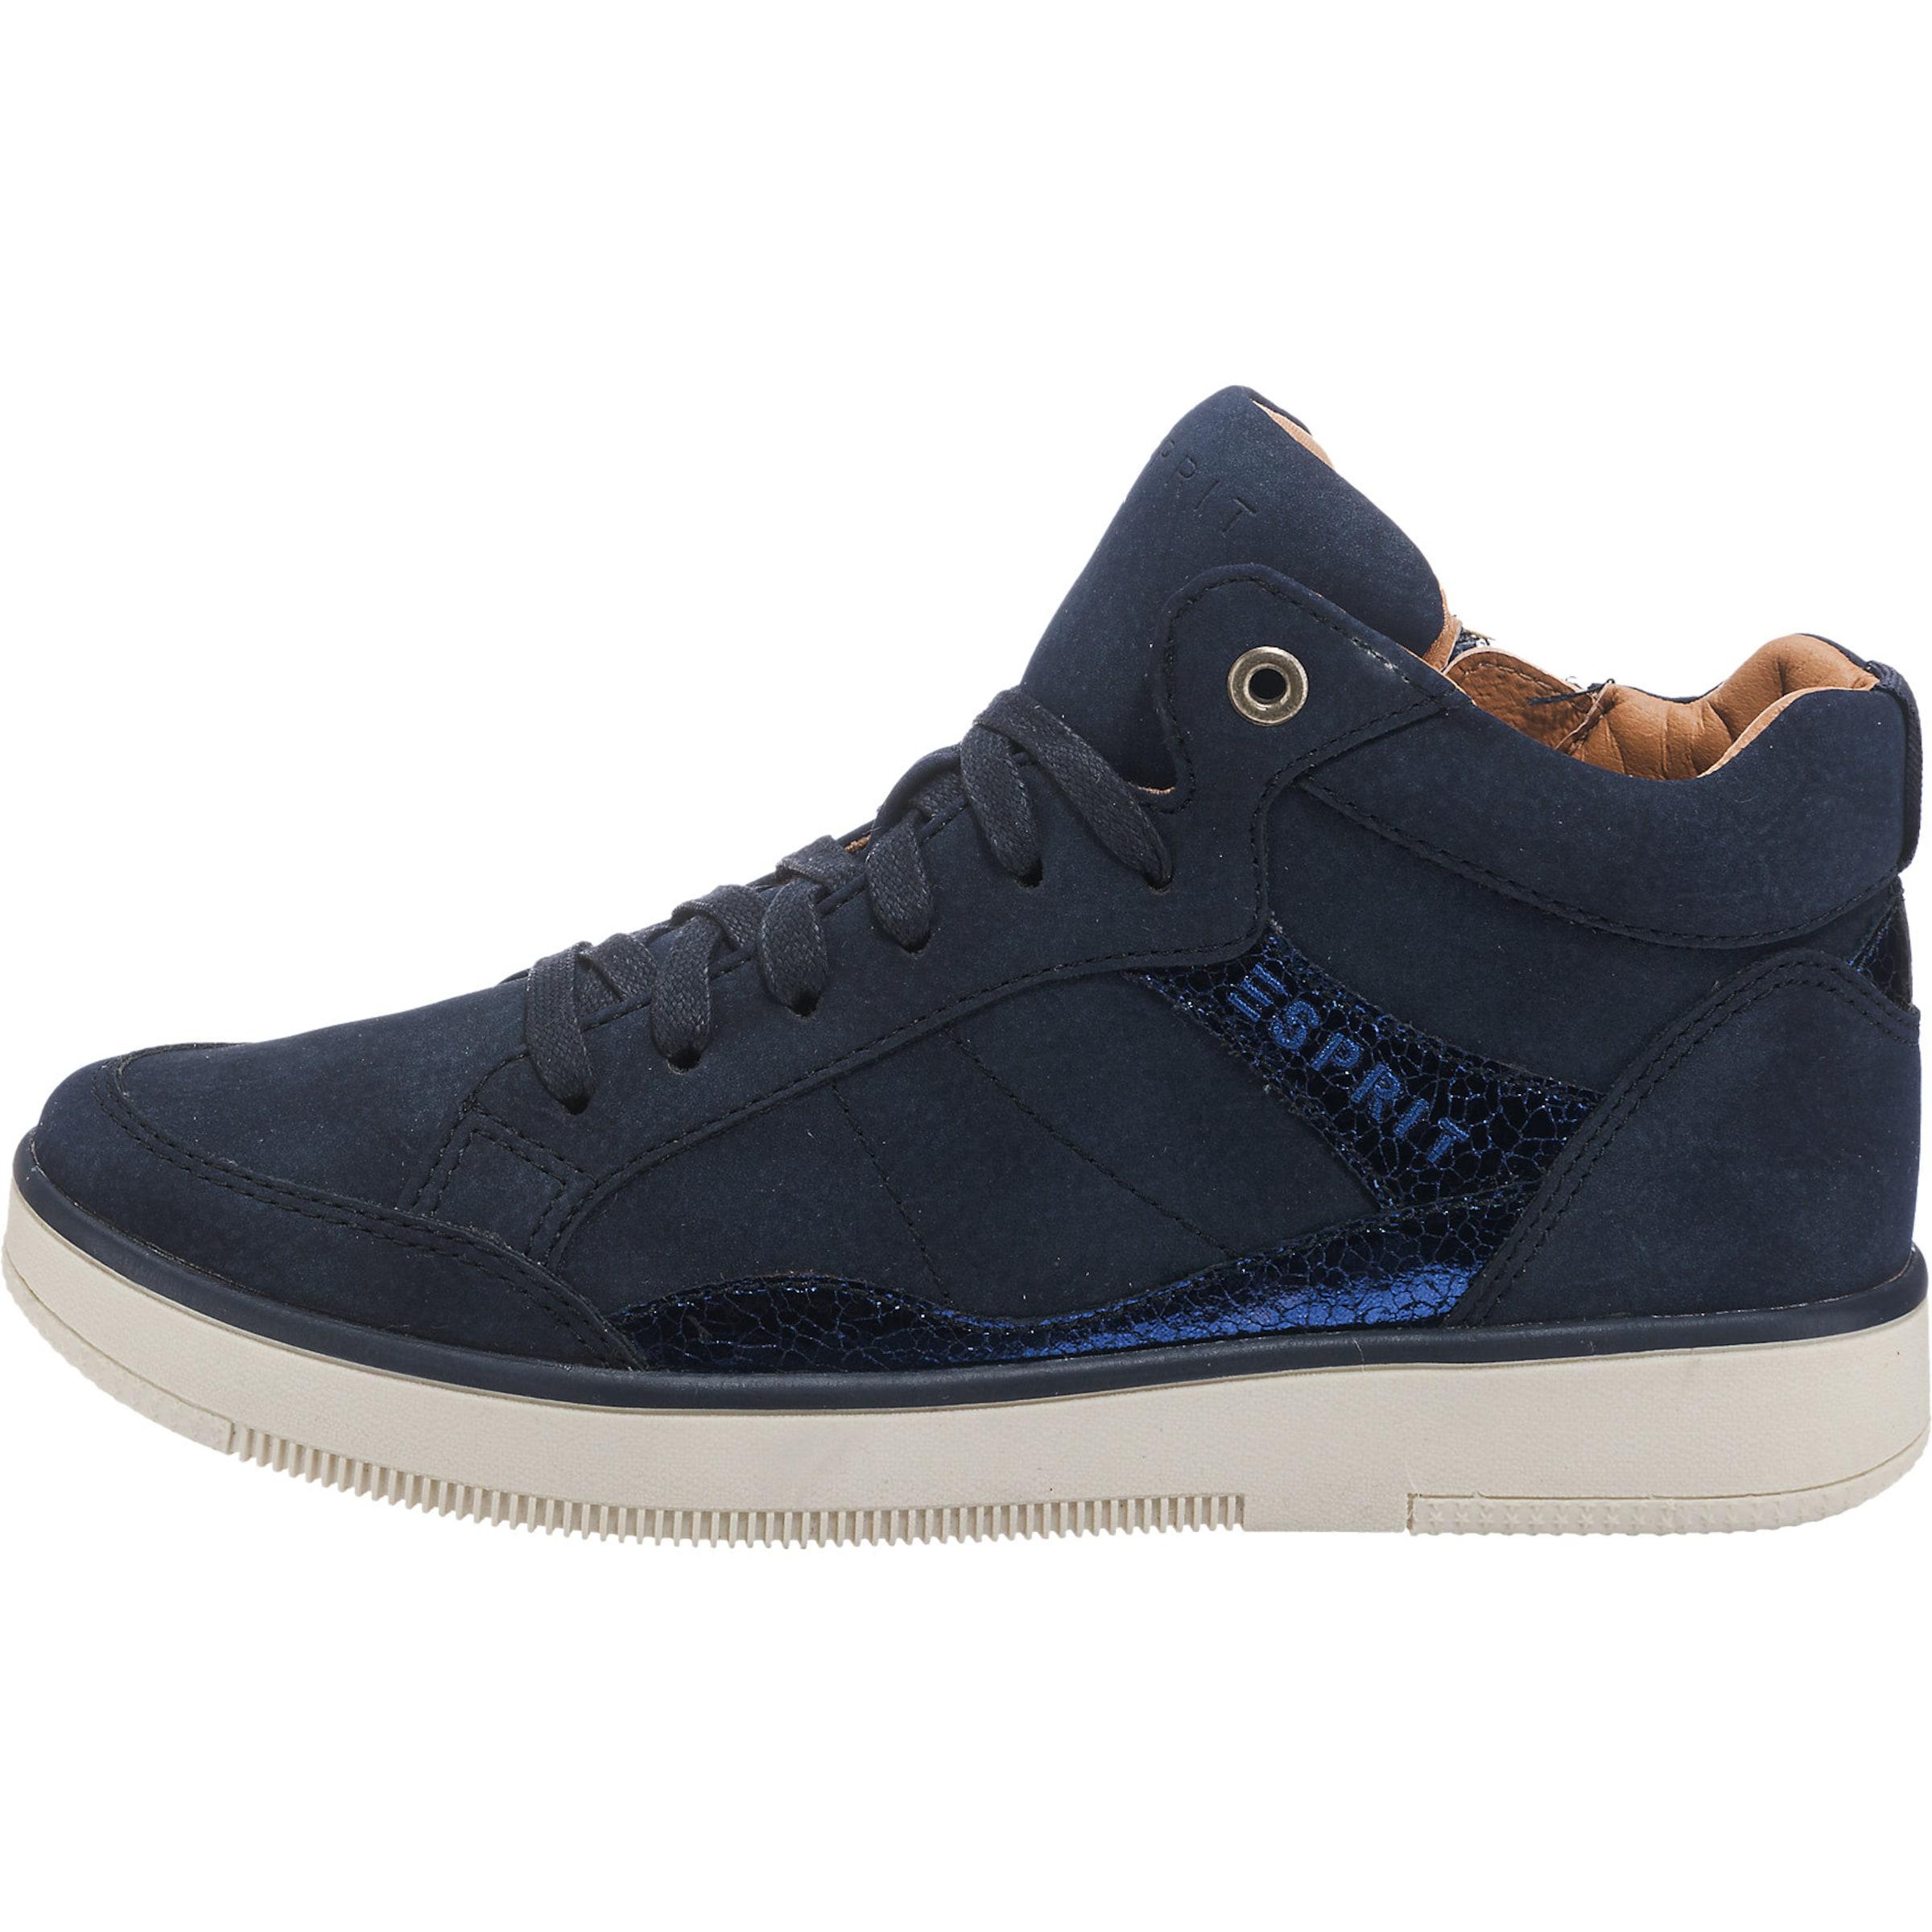 ESPRIT ESPRIT Sneaker 'Desire' 'Desire' ESPRIT Sneaker Sneaker 'Desire' BxqAn8a7B